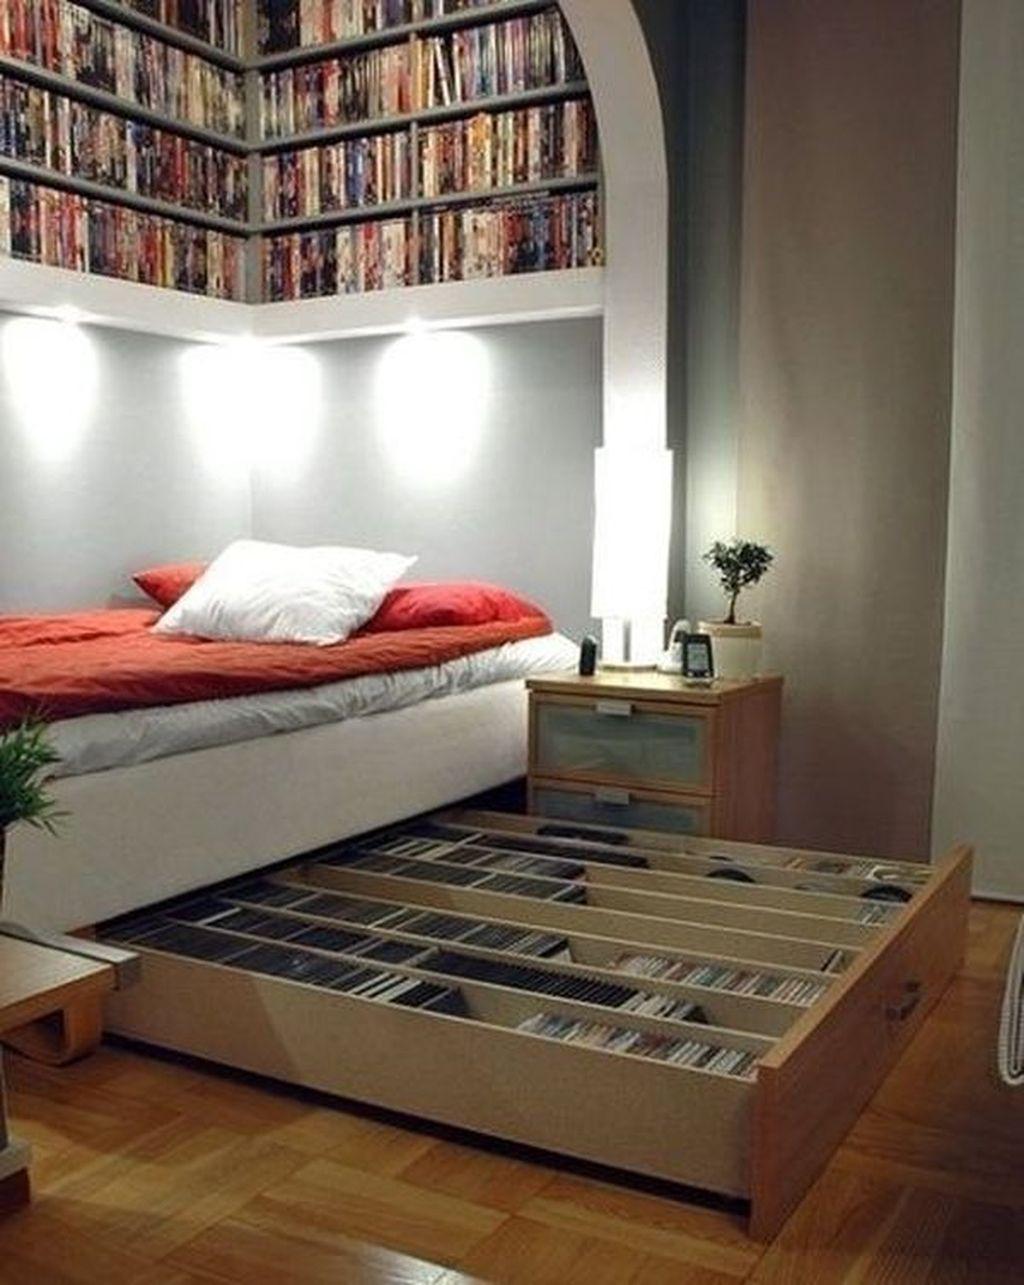 Best Multi Functional Furniture Design Ideas That For Apartment 39